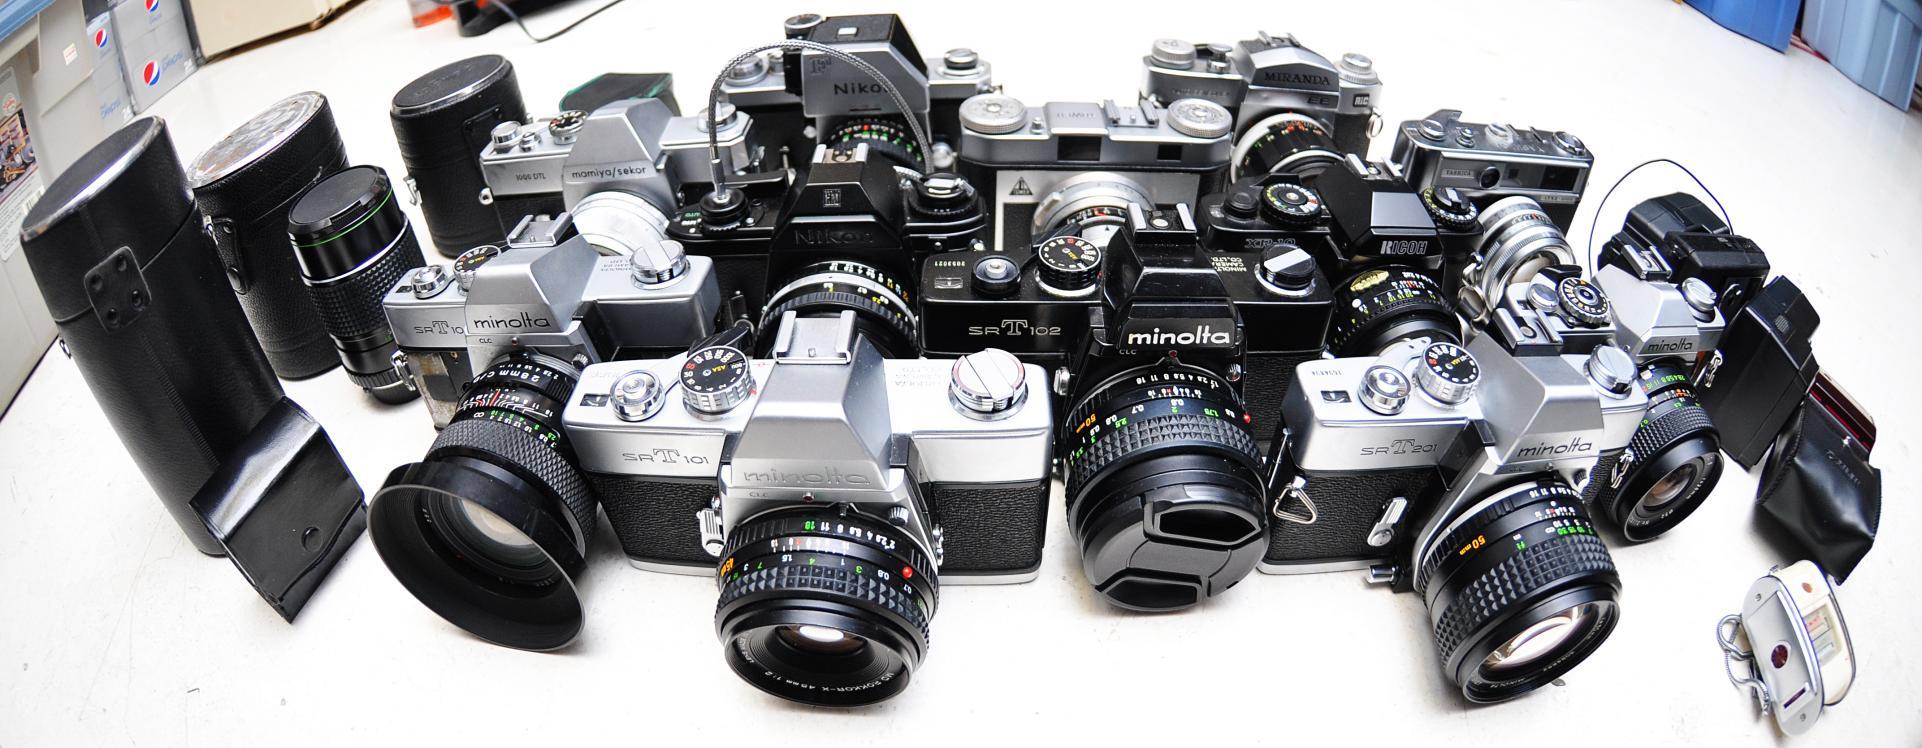 camera collection.jpg